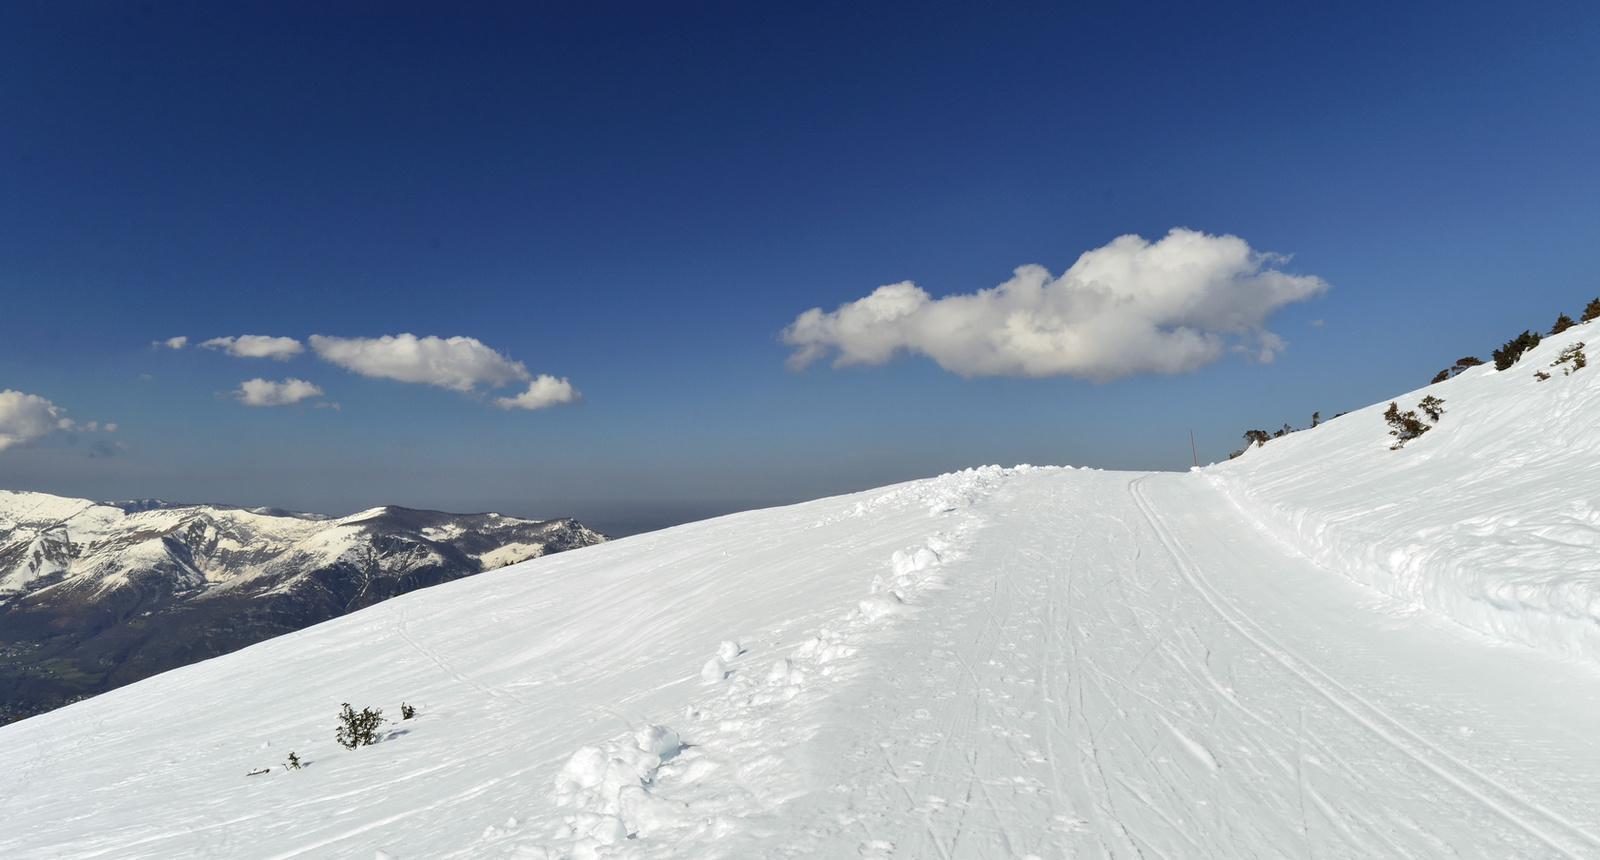 Station de ski d'Hautacam